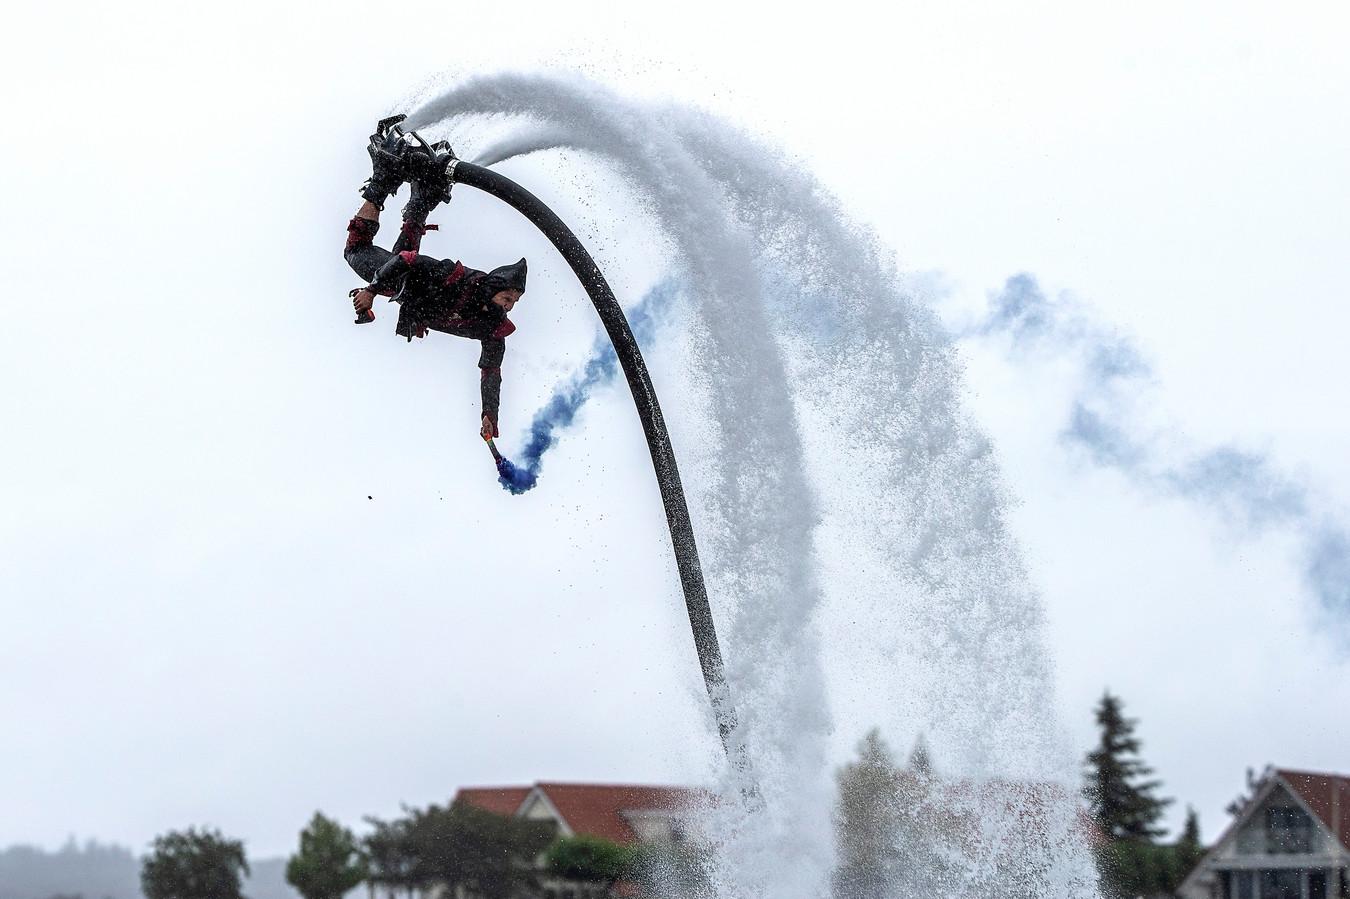 Wateracrobatiek bij Dreamfields.